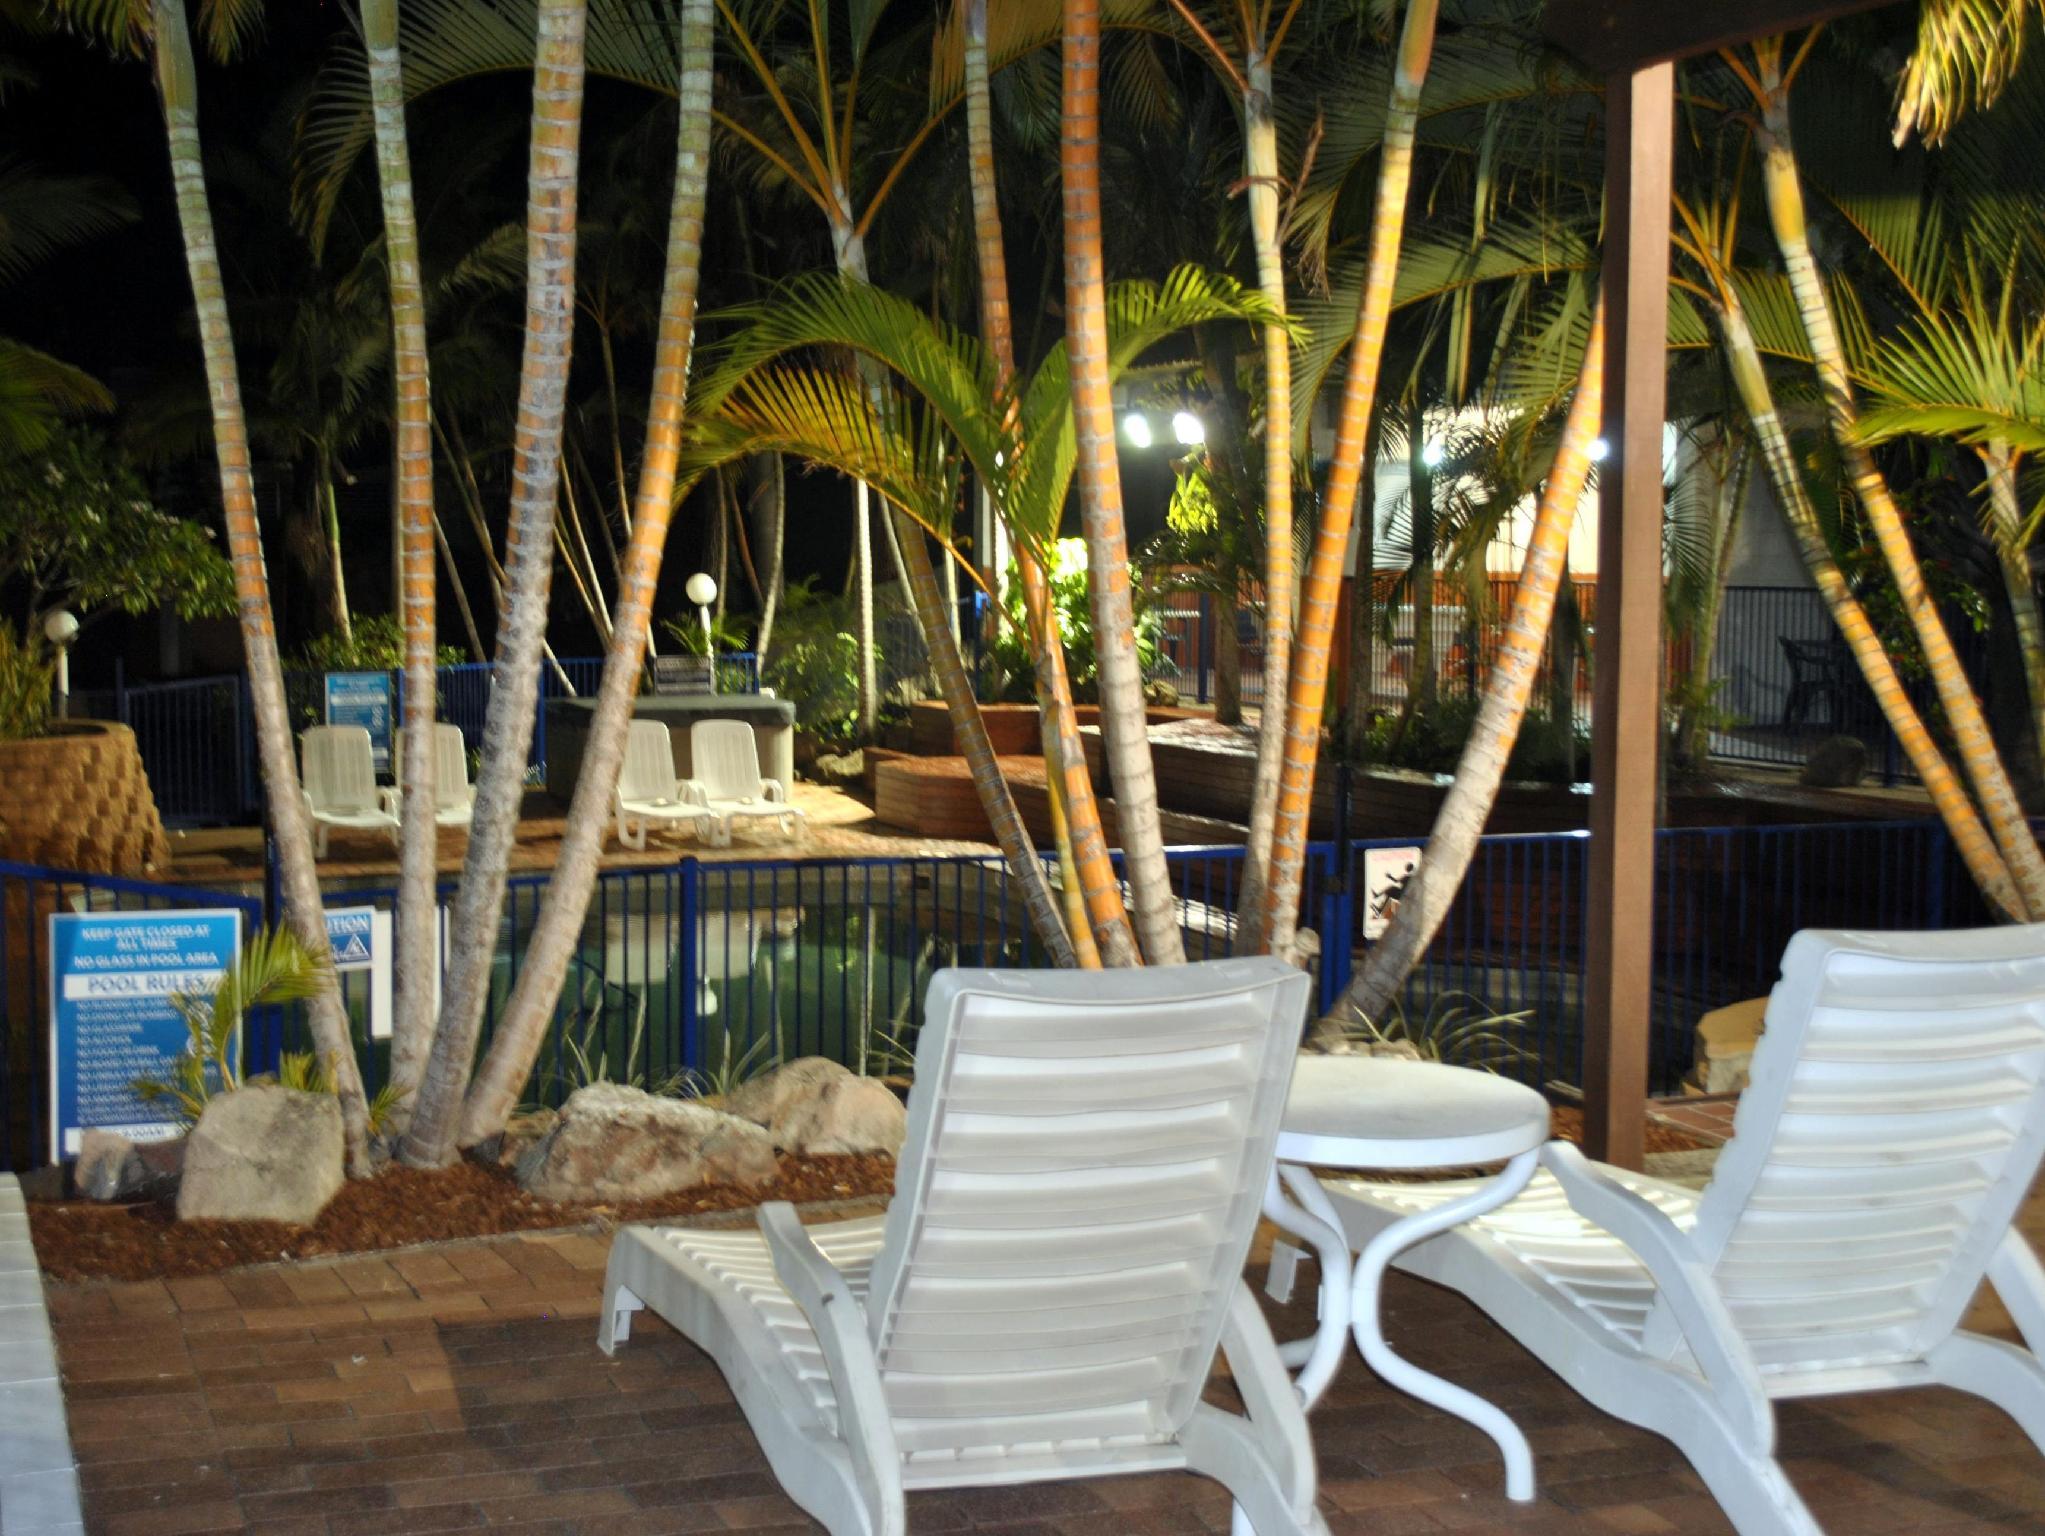 Club Surfers Hotel - Hotell och Boende i Australien , Guldkusten